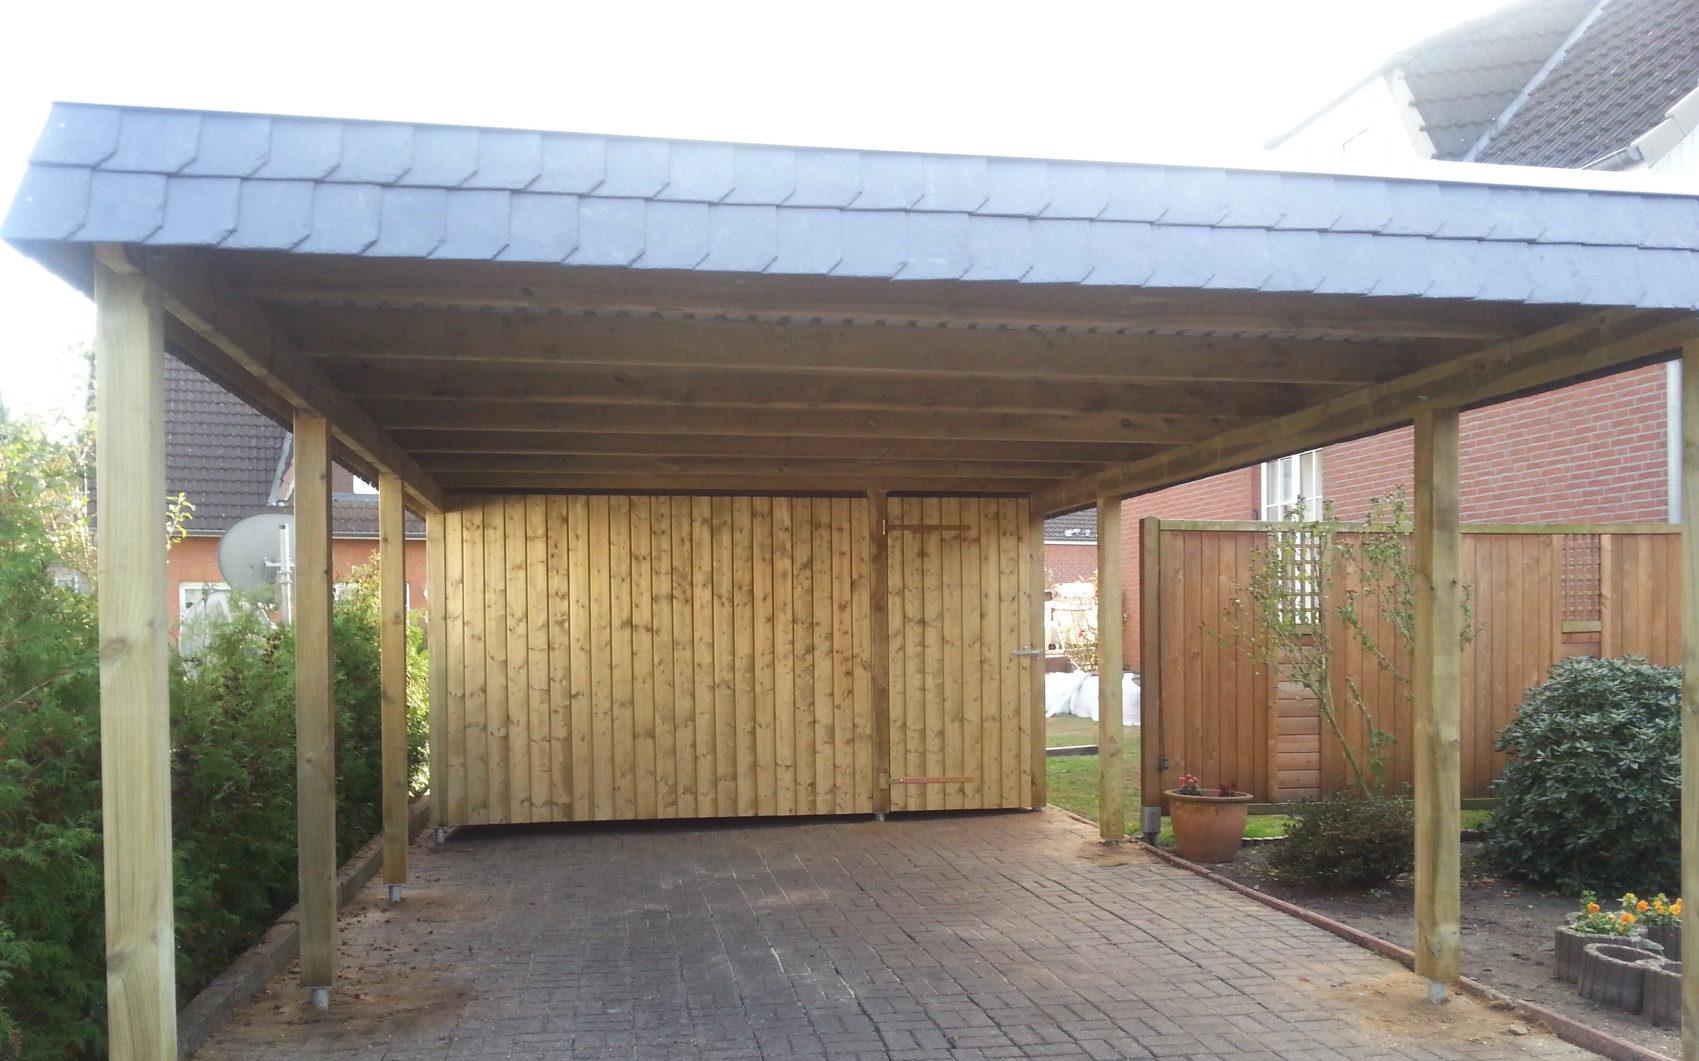 Holz Carport carportNORD